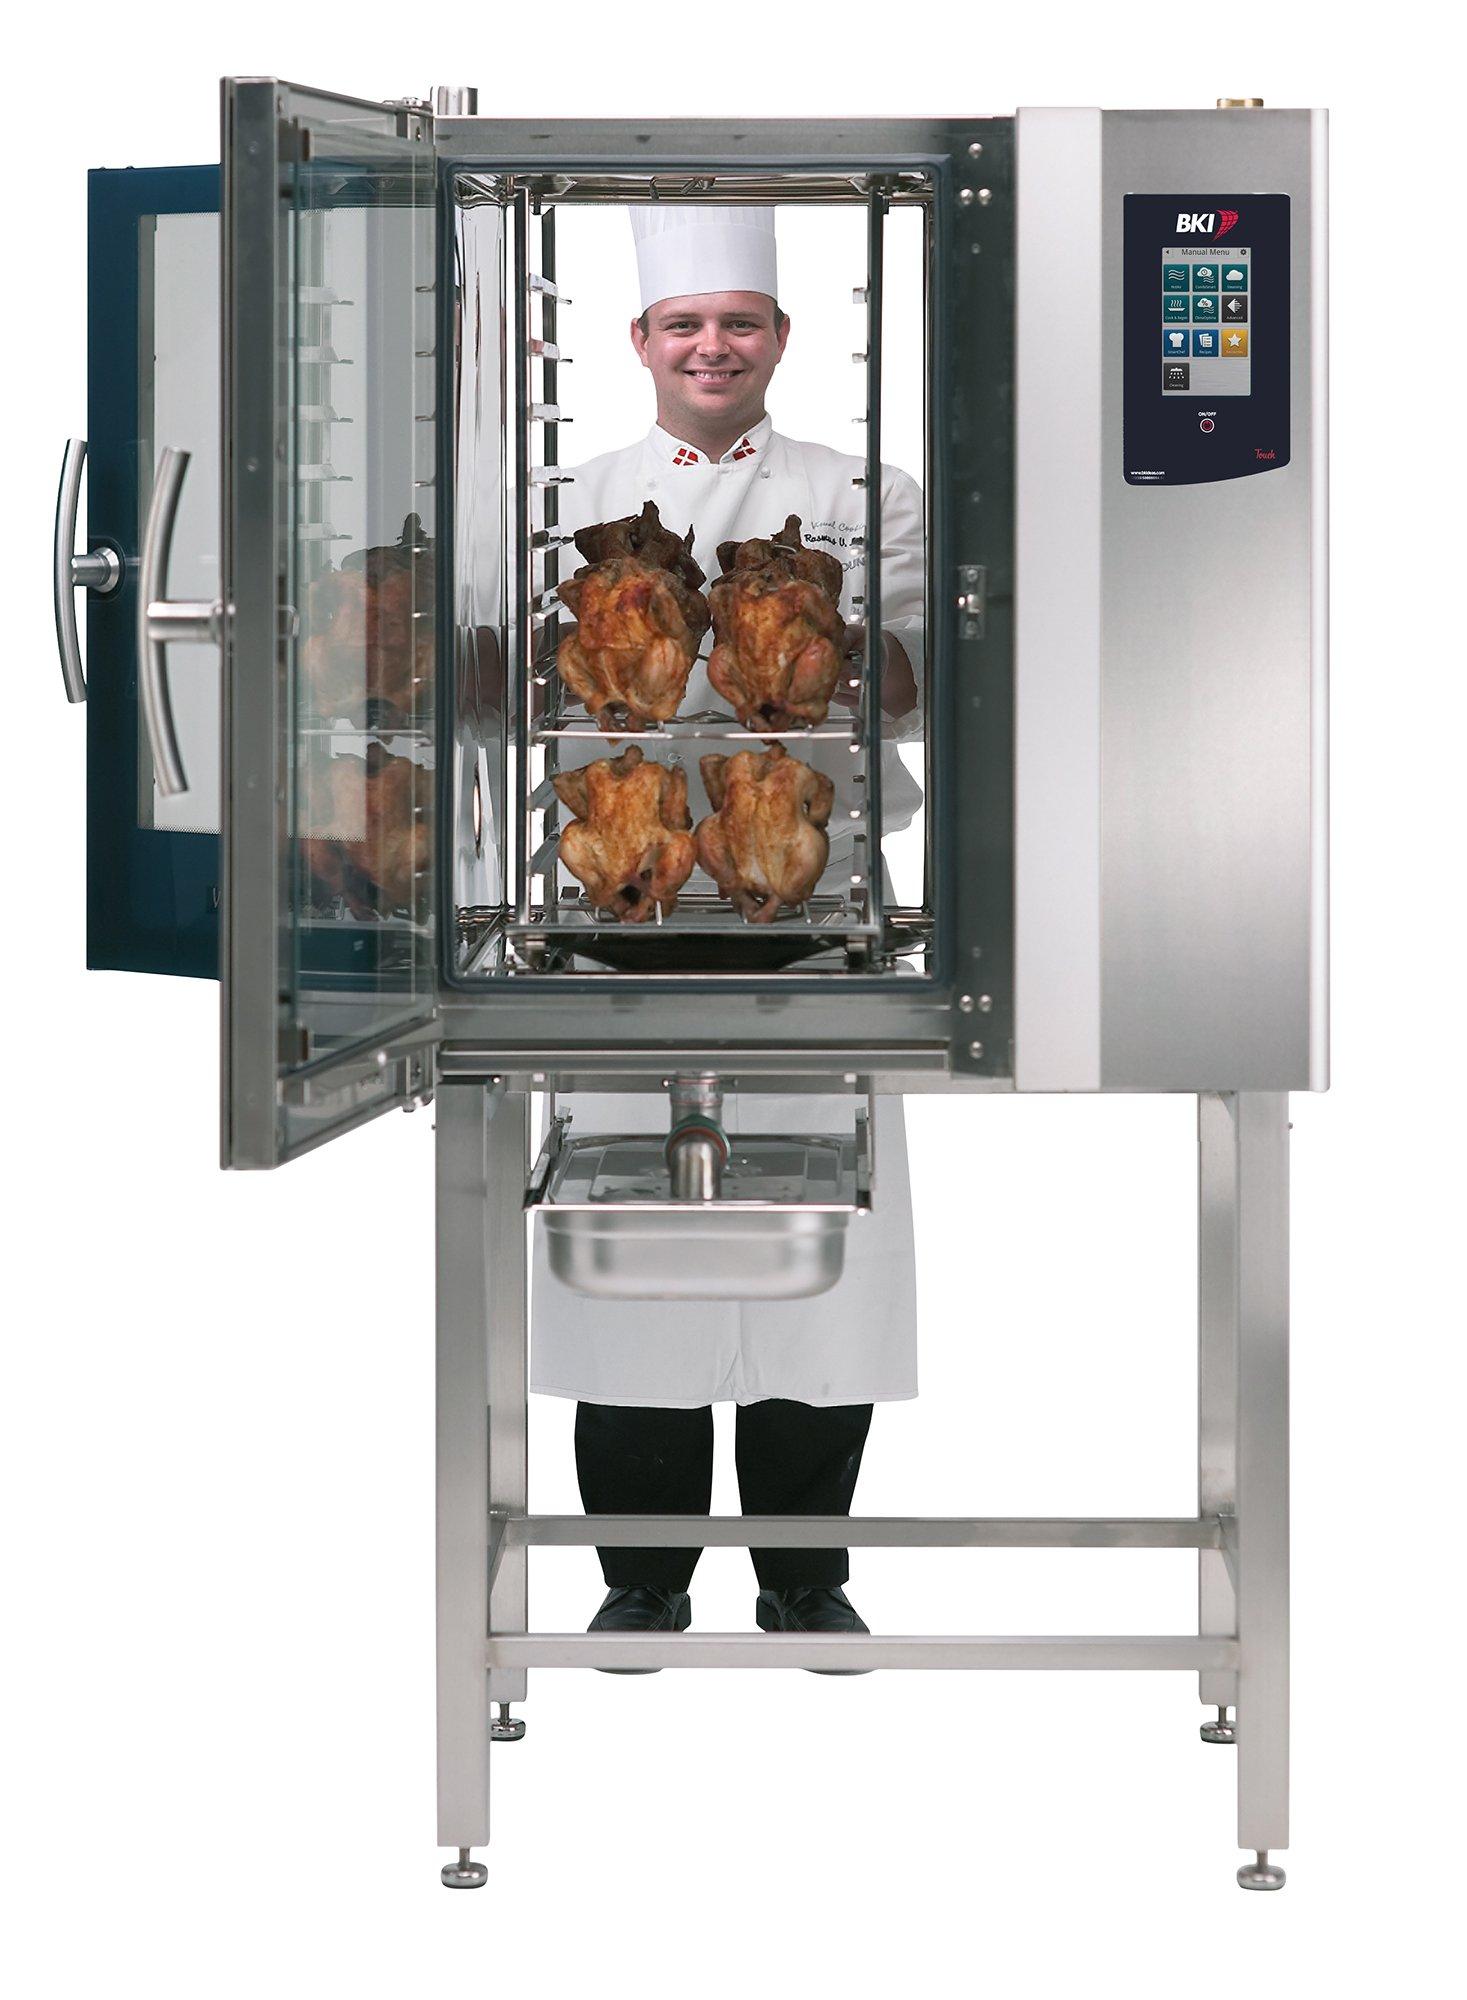 PassThrough Ovens